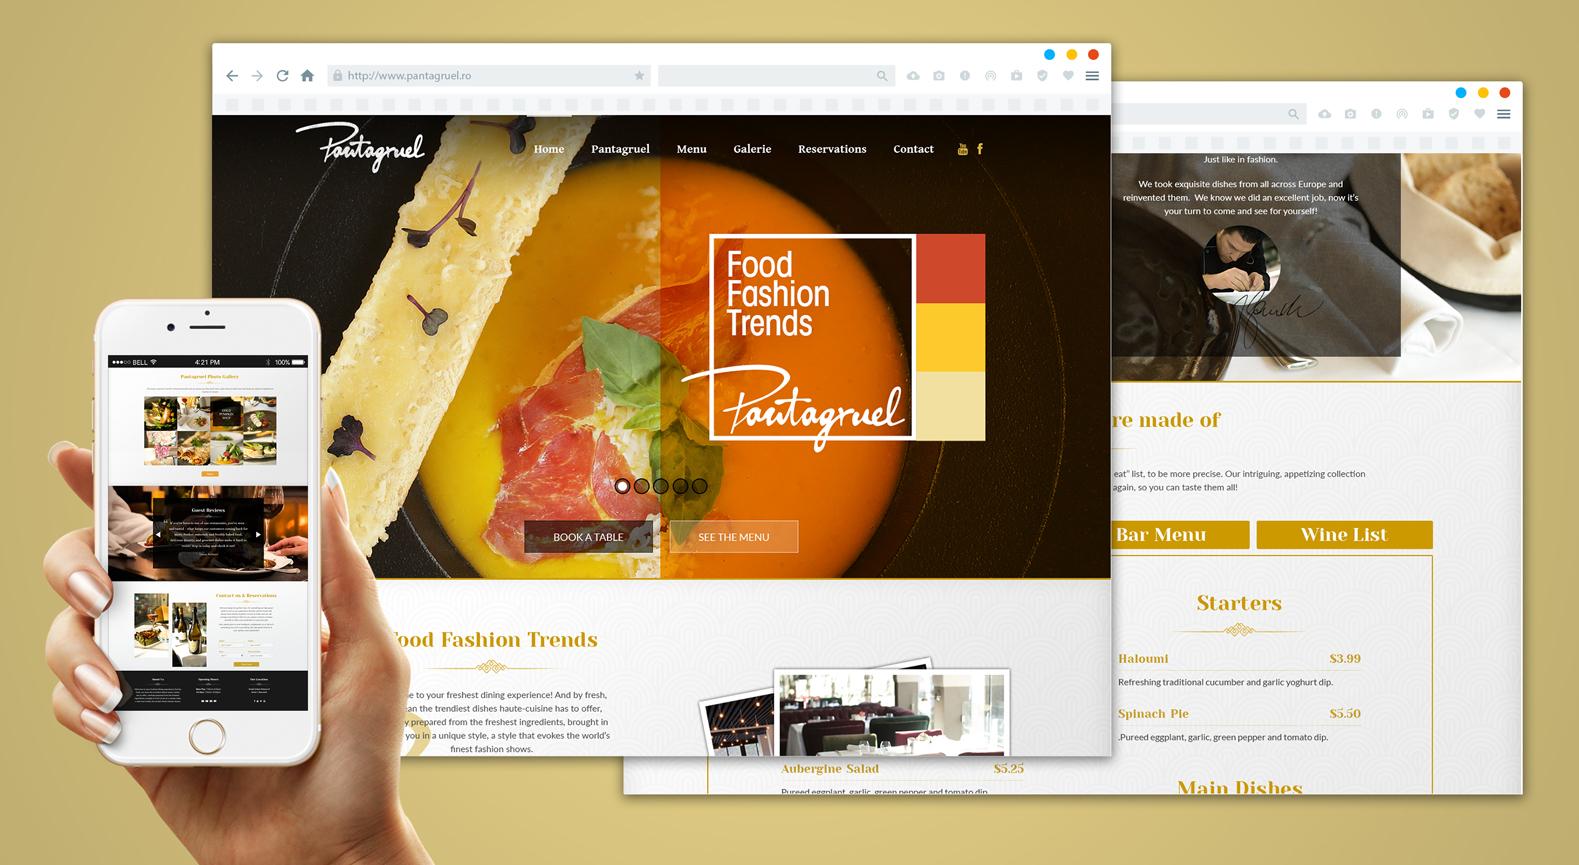 tudor_deleanu_creative_design_art_advertising_web_website__0002_pantagruel